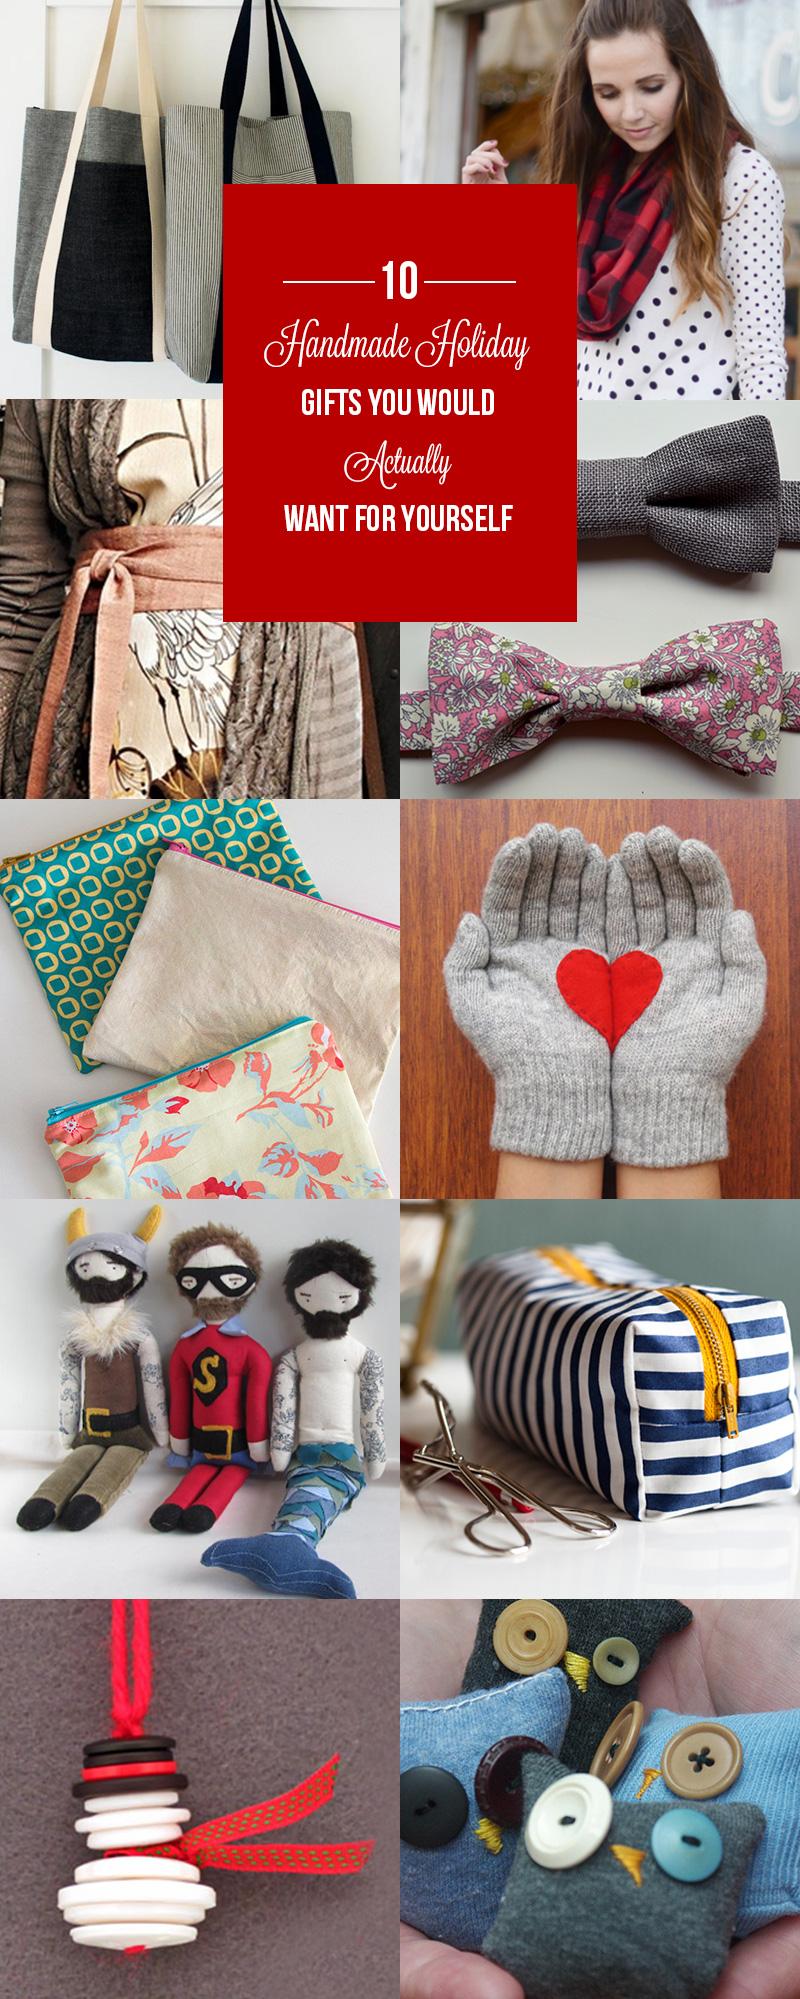 Ten Handmade Holiday DIY Gifts